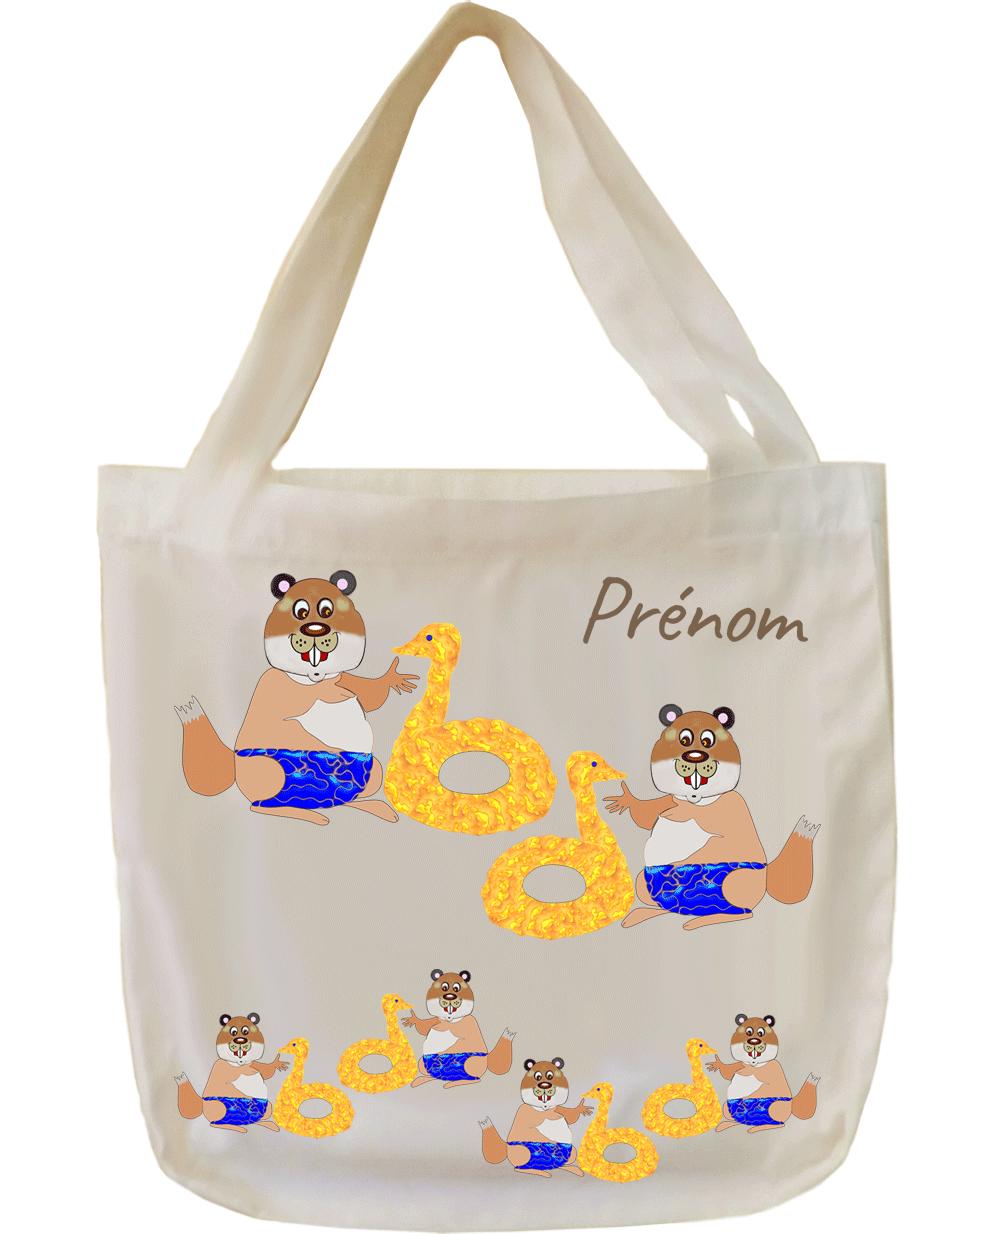 tote-bag;sac;cabas;texti;cadeaux;personnalisable;personnalisation;personnalise;prenom;animal;mer;marmotte;bouee;loisir